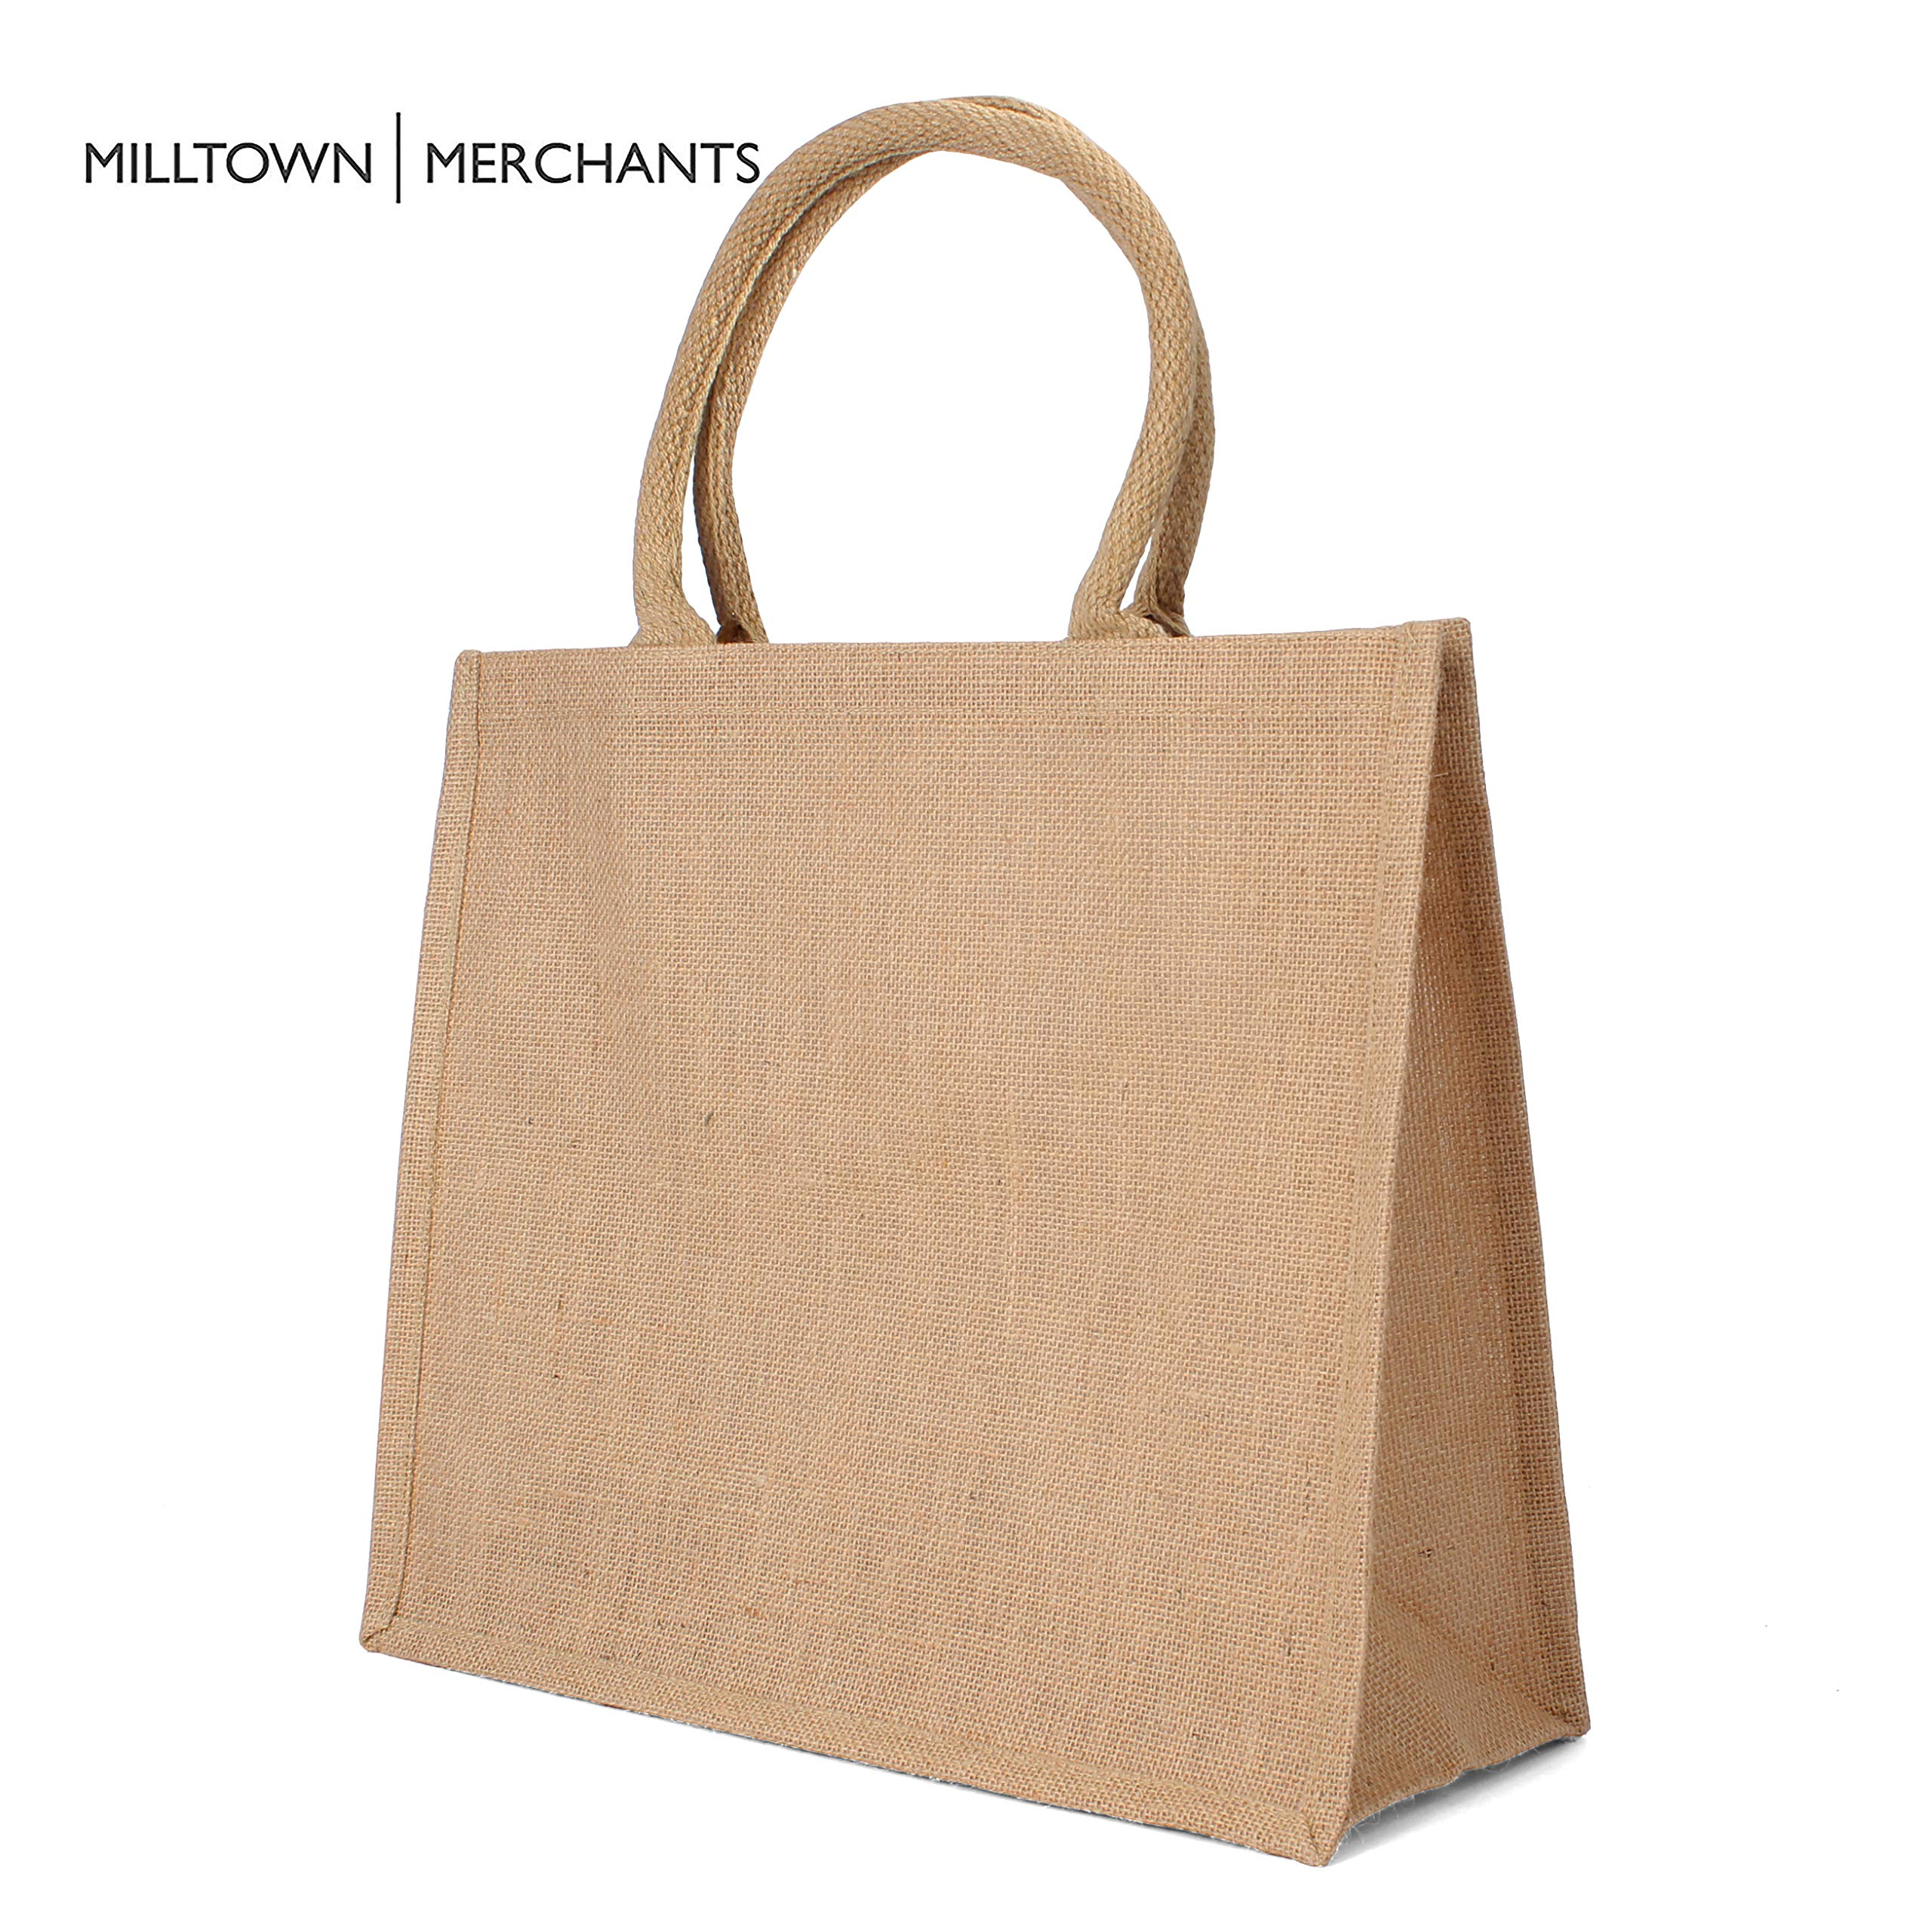 Size Large Customizable Reusable Natural Jute Burlap Tote Bag Laminated Interior wFull Gusset